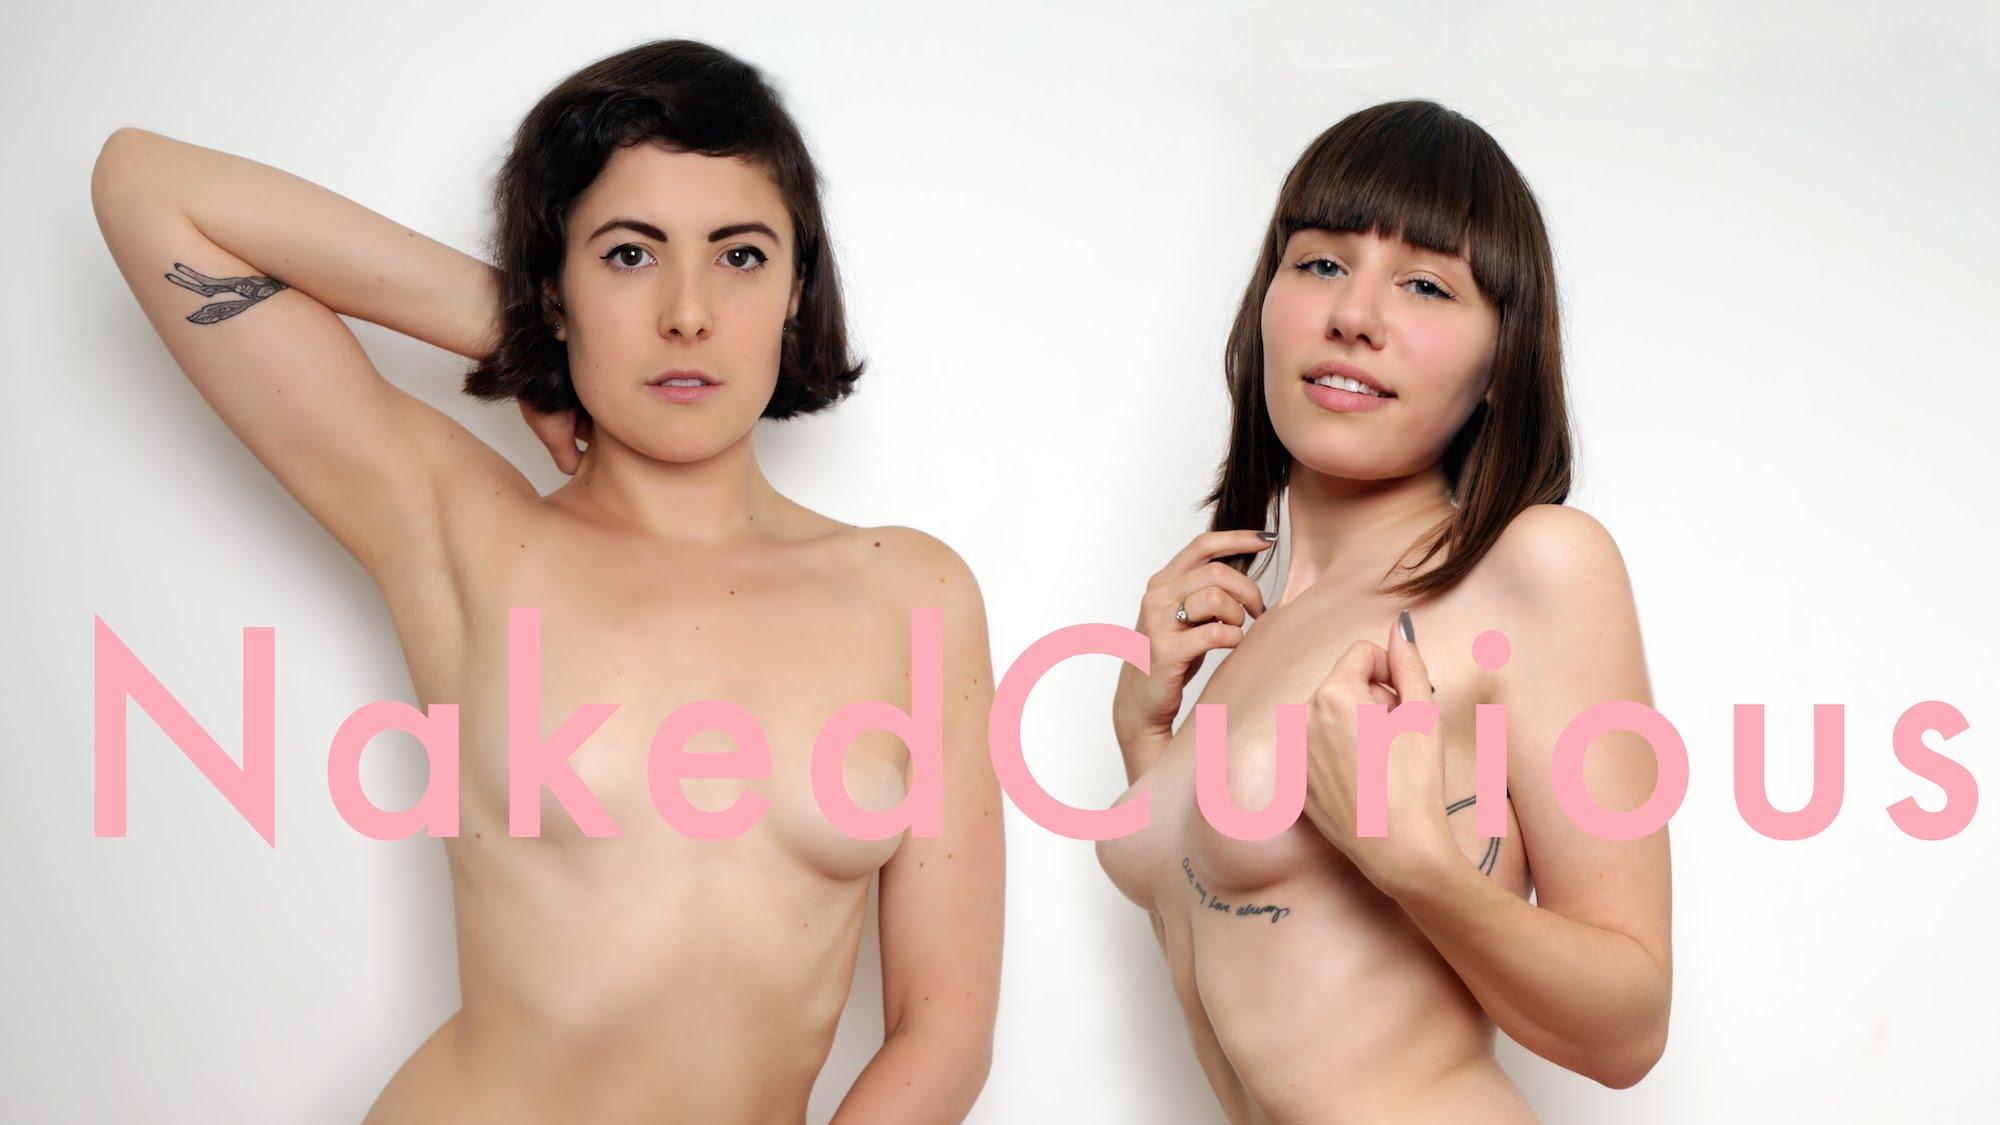 Normal body nudes